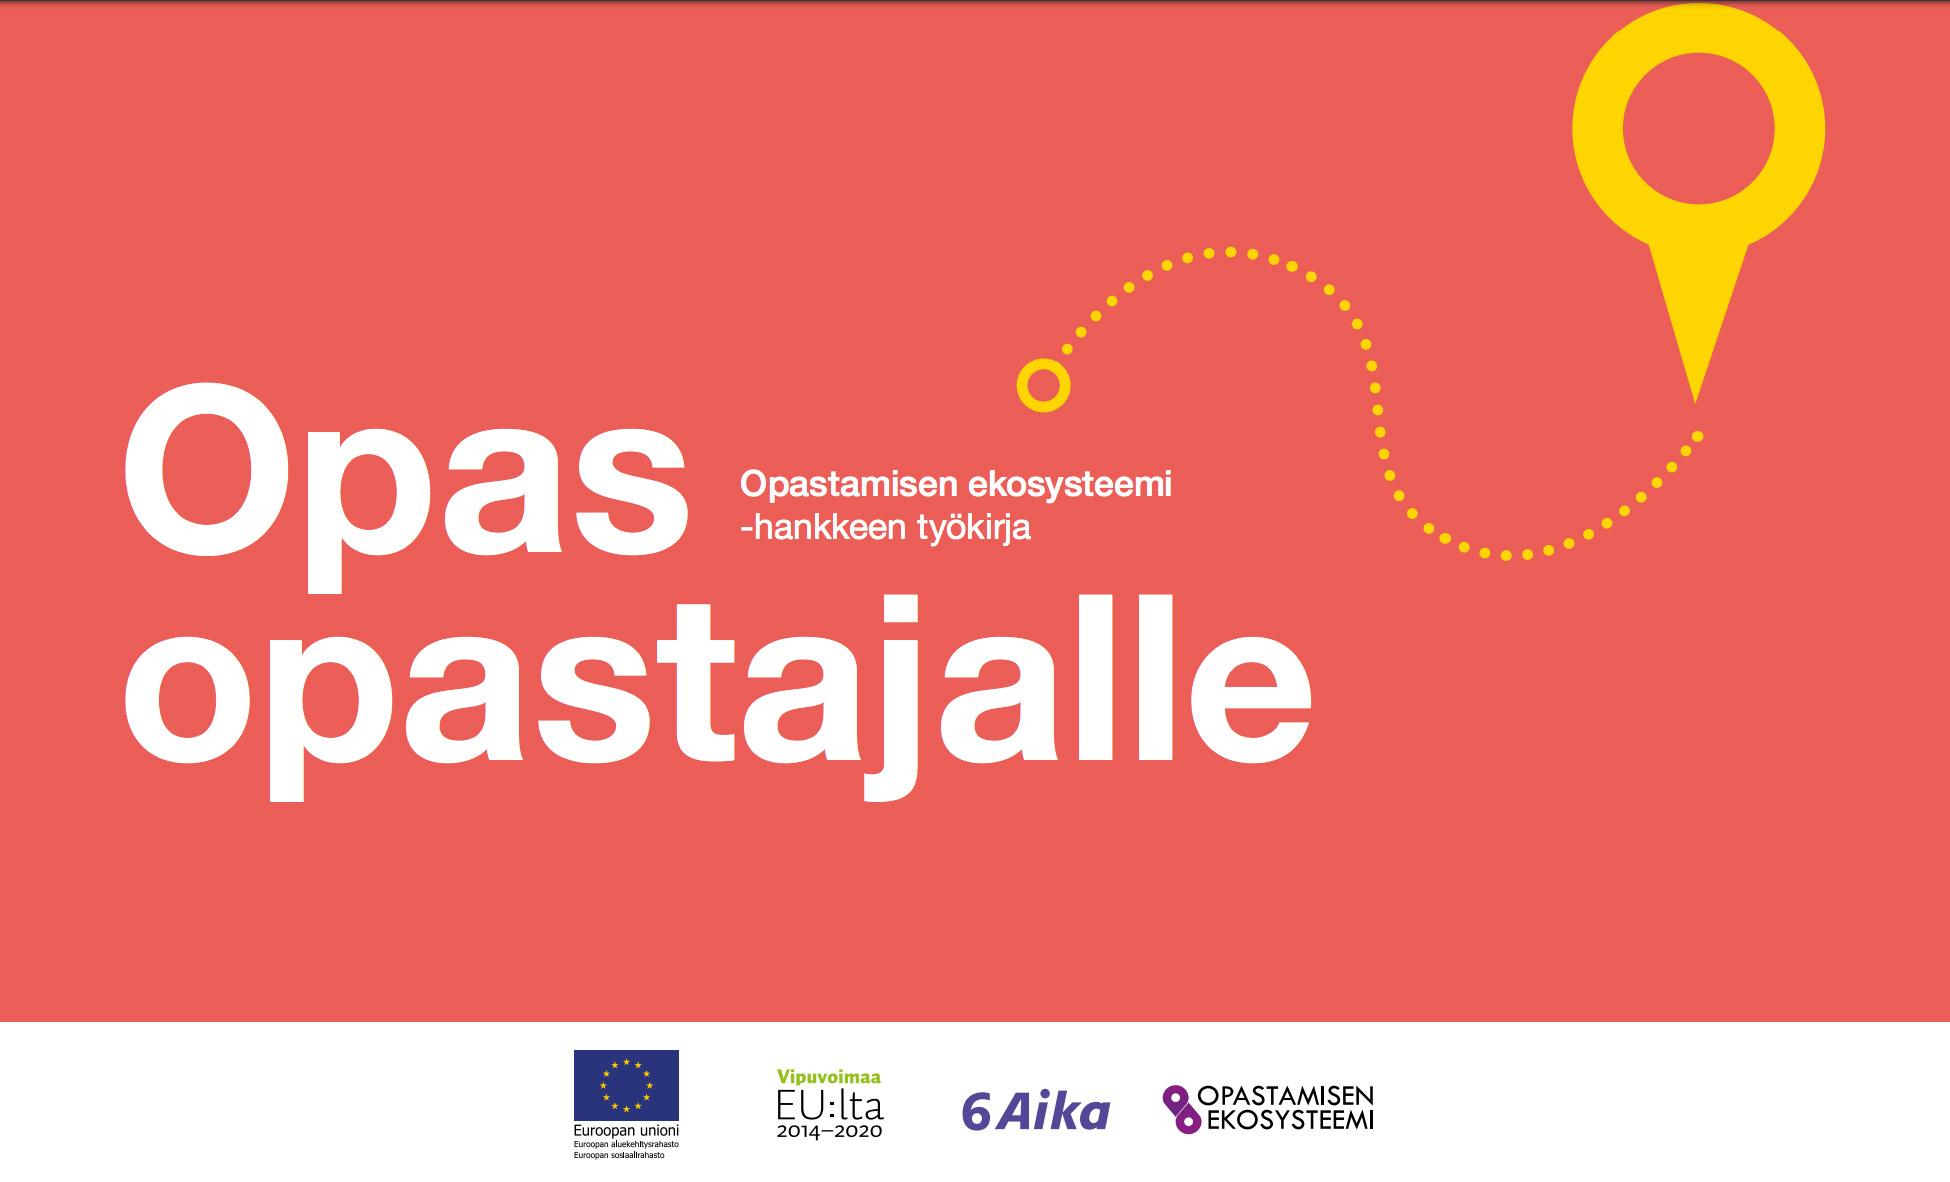 Cover for article 'Opas opastajalle -työkirja'